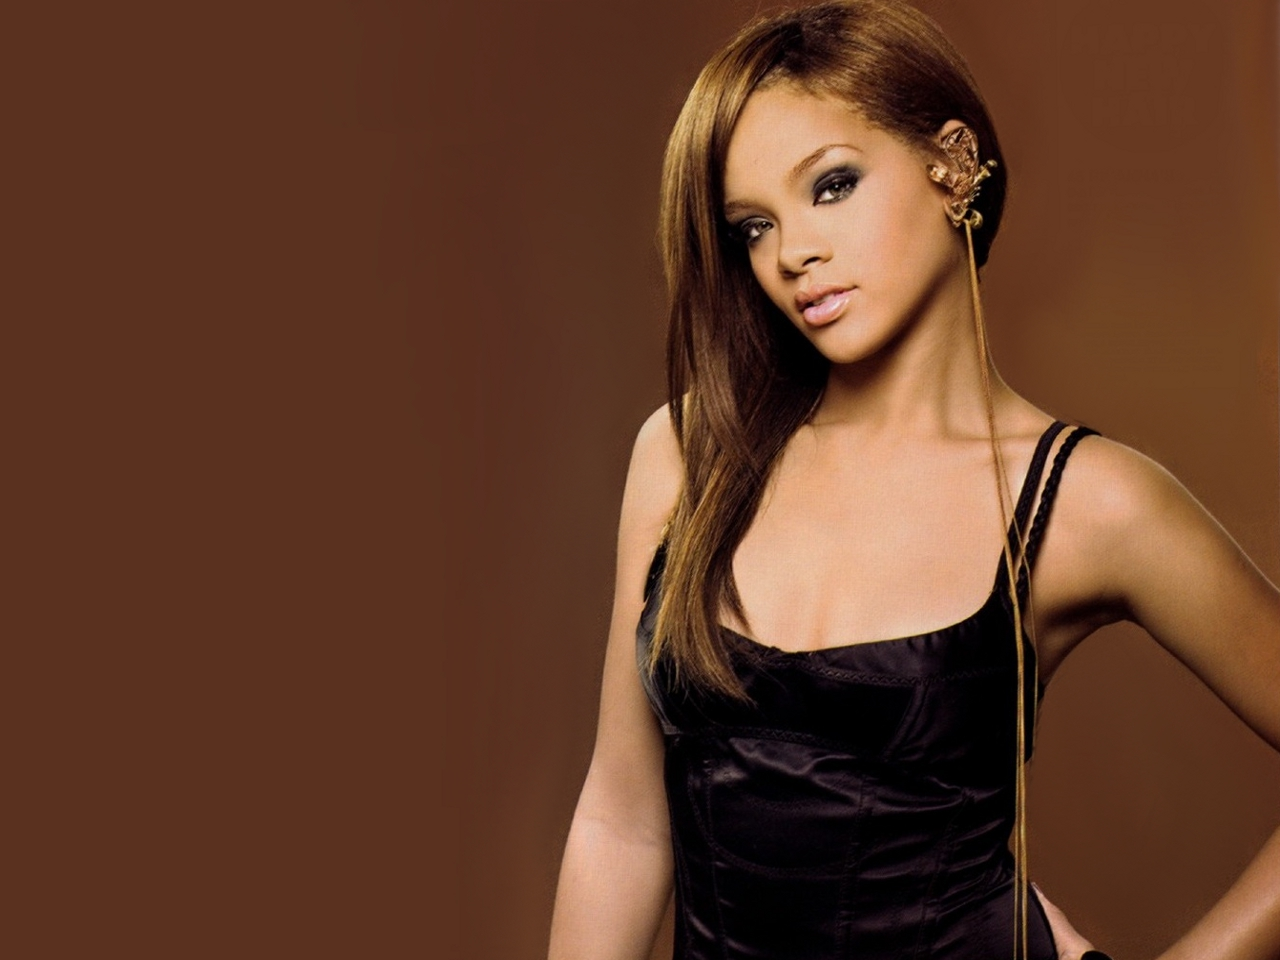 Rihanna Rihanna Sophisticate's Black Hair magazine